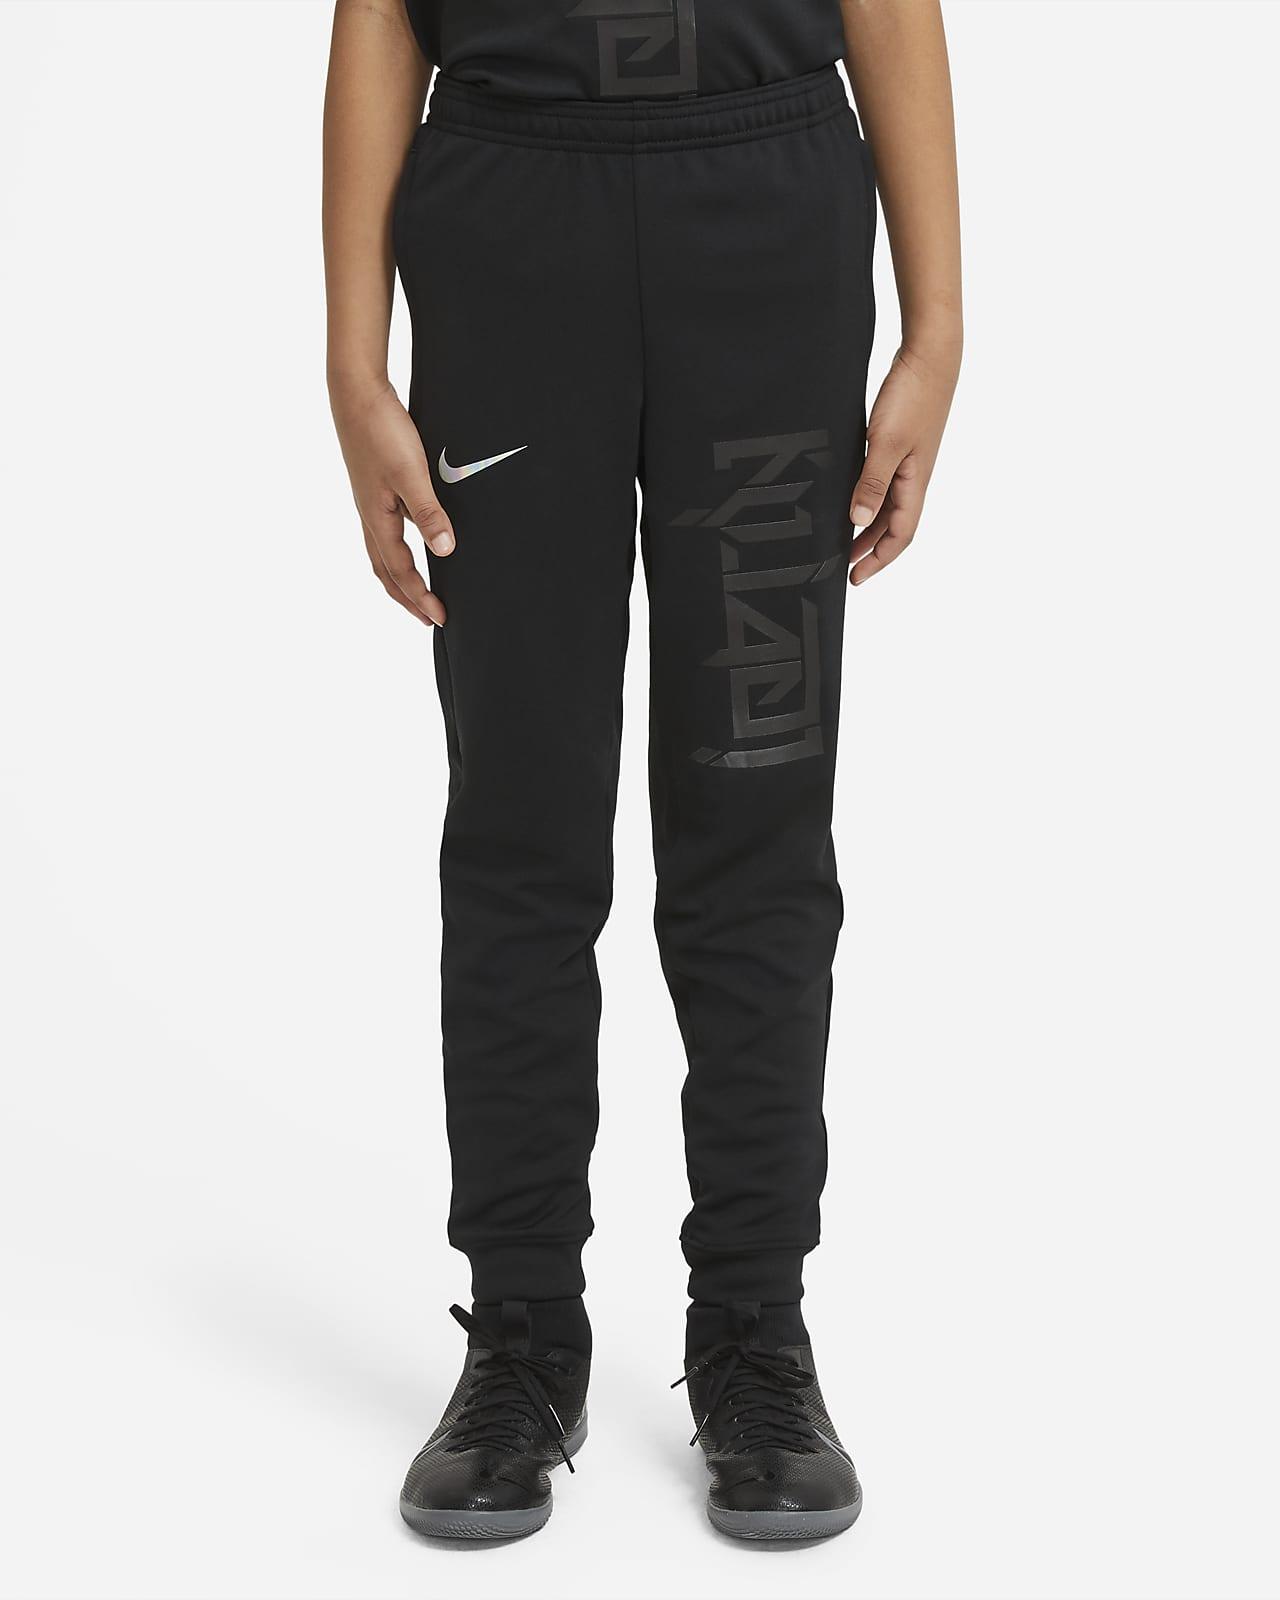 Nike Dri-FIT Kylian Mbappé Older Kids' Knit Football Pants